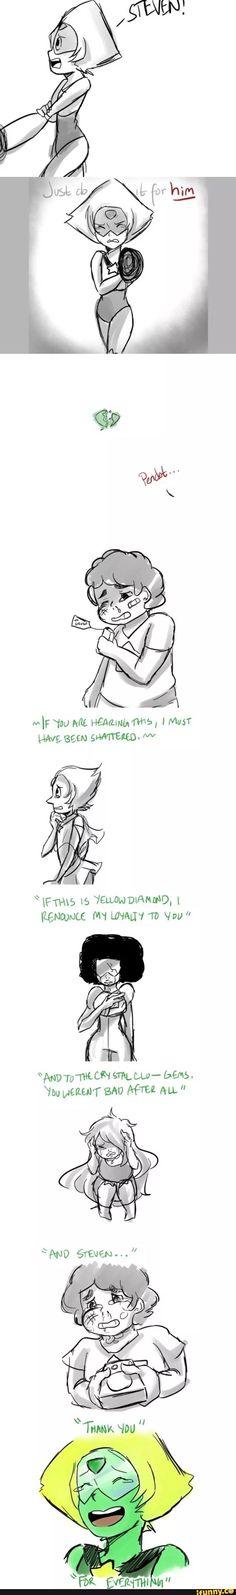 true, tumblr, stevenuniverse, sad, peridot